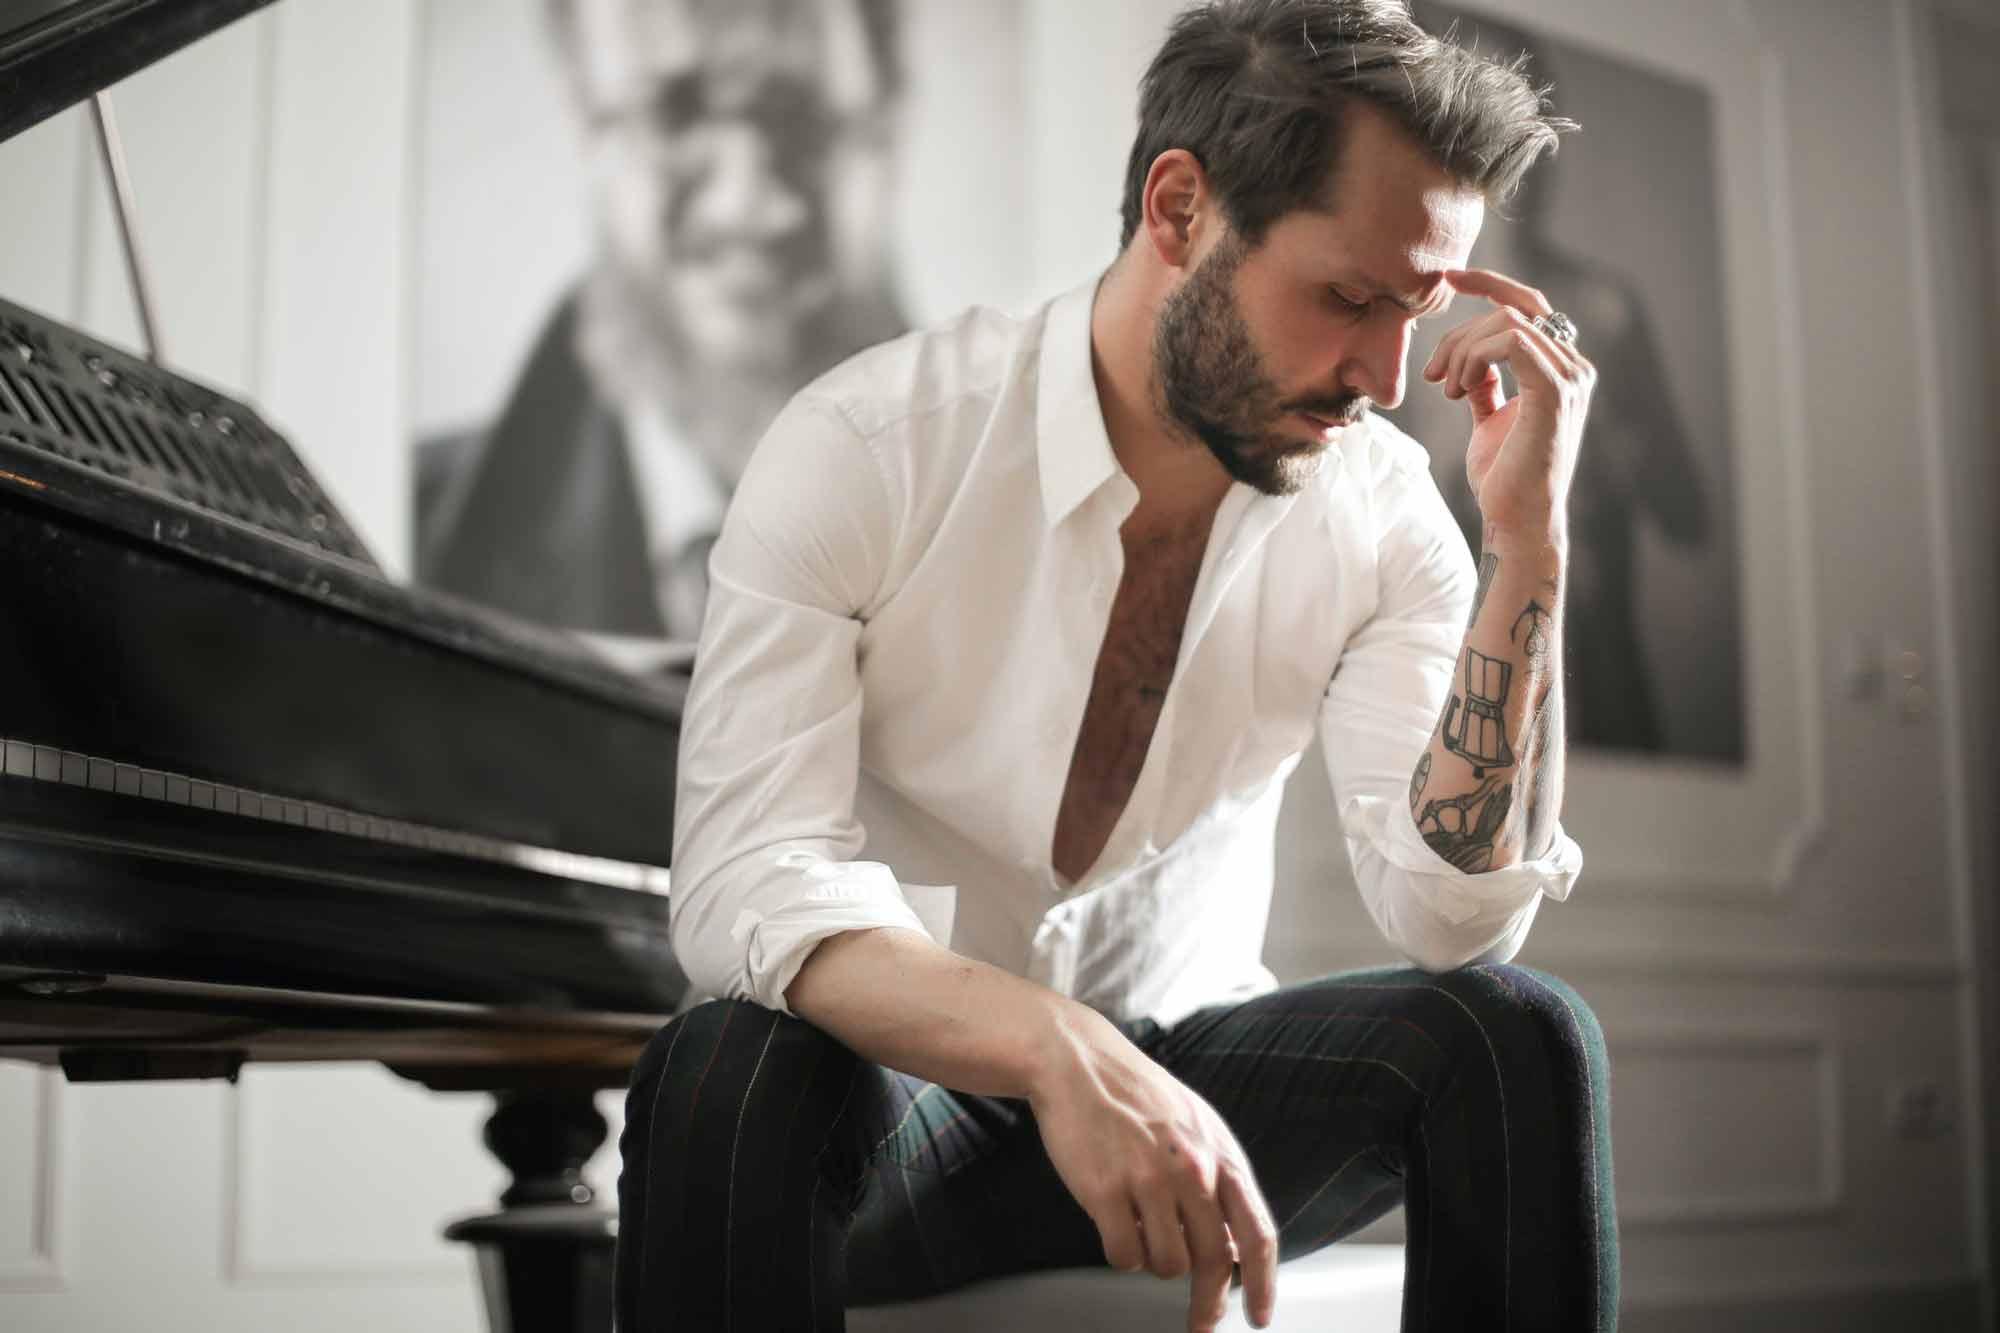 artist music gig finder